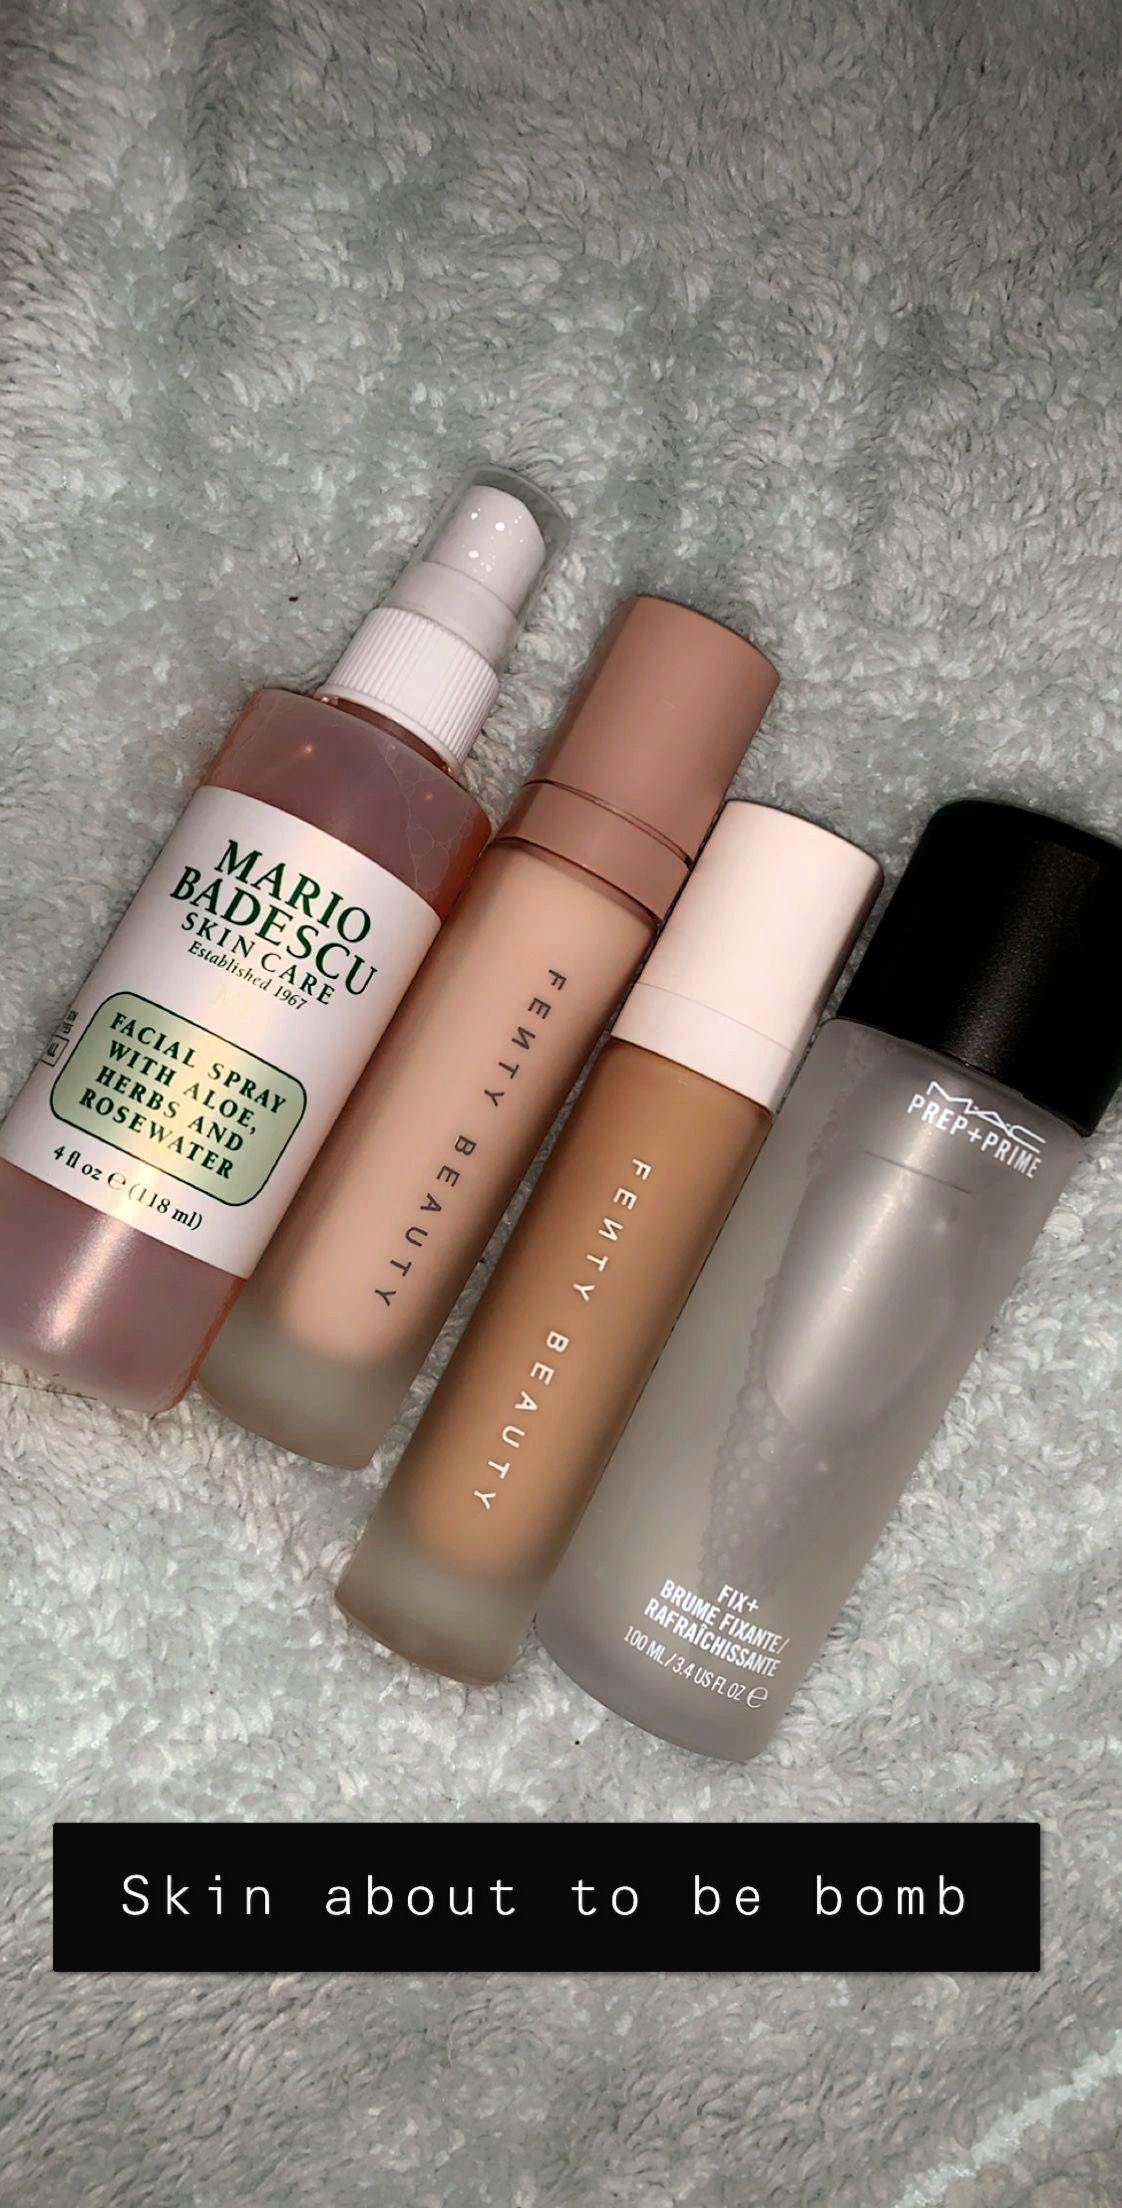 Skin Care Products At Cvs Despite Skincare Mini Fridge Uk Makeup Skin Care Makeup Revolution Beauty Skin Care